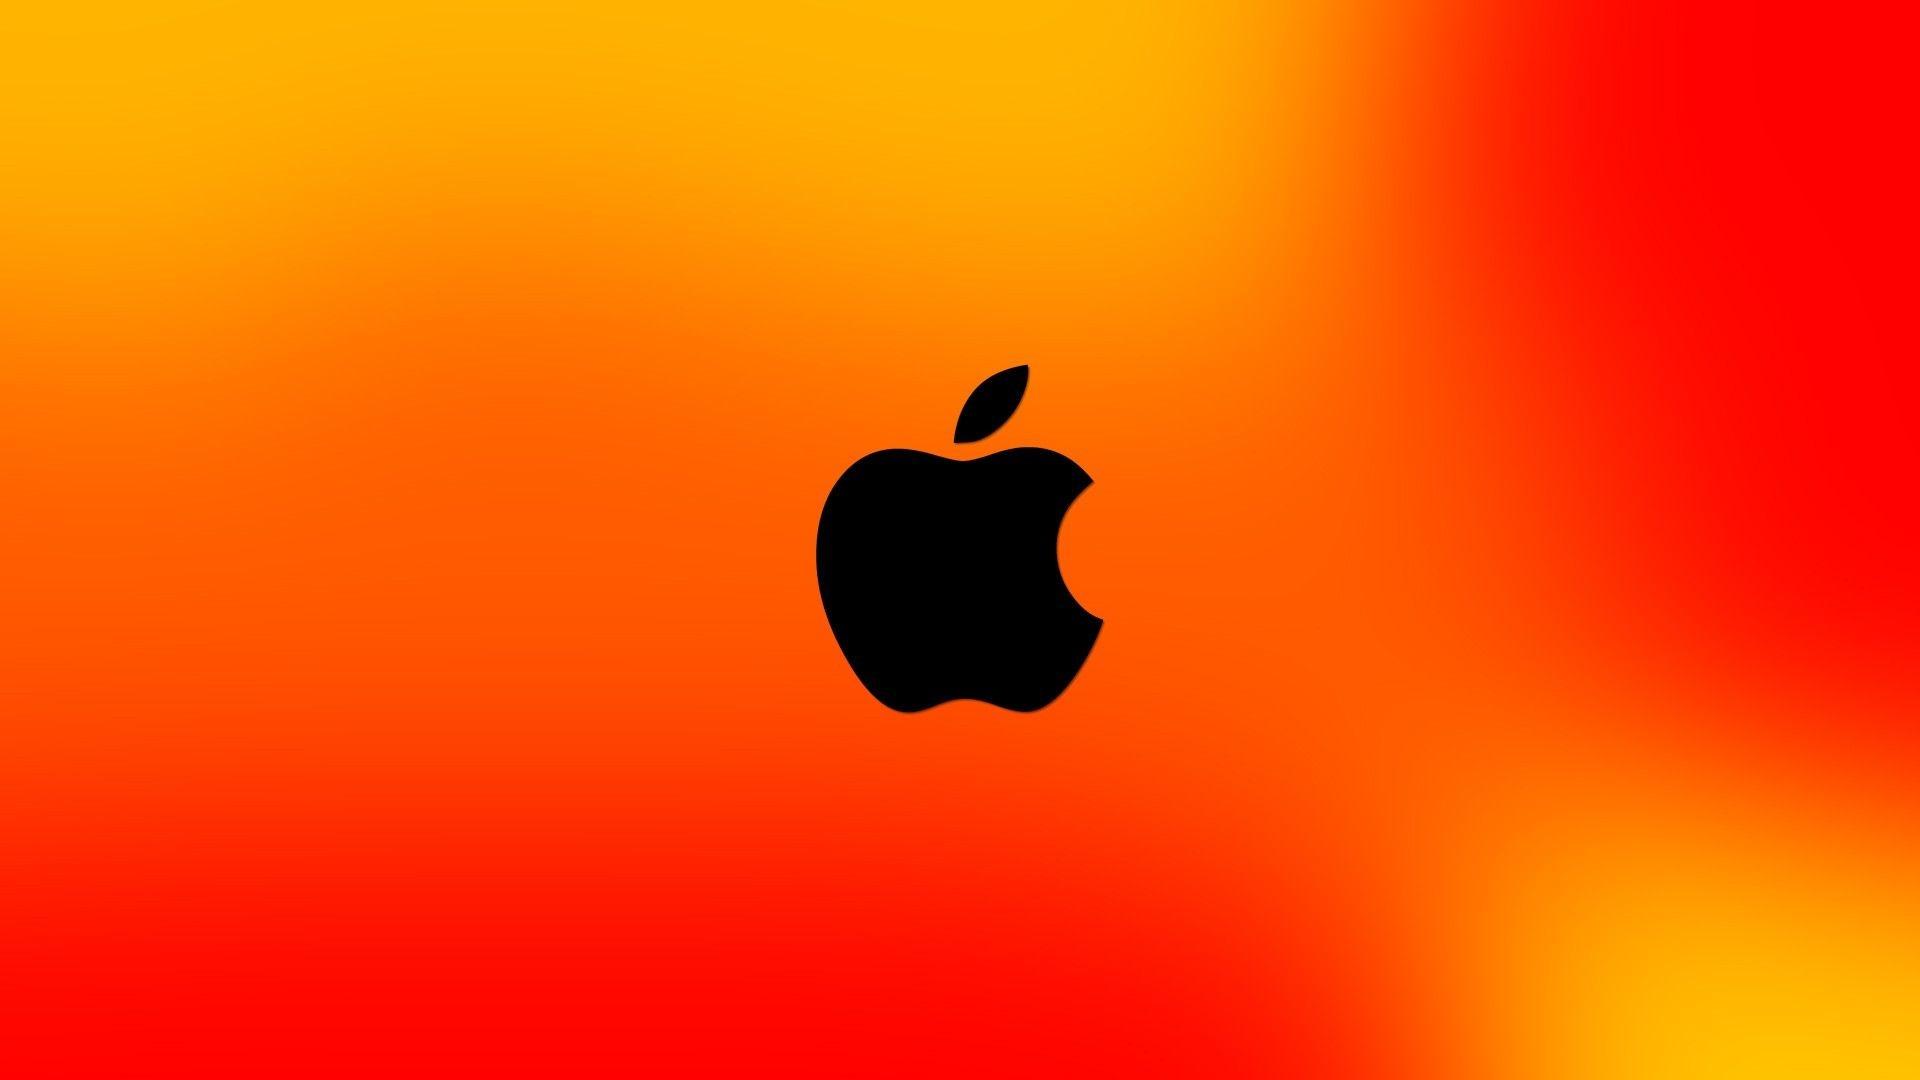 Res: 1920x1080, Orange Black Apple Wallpaper